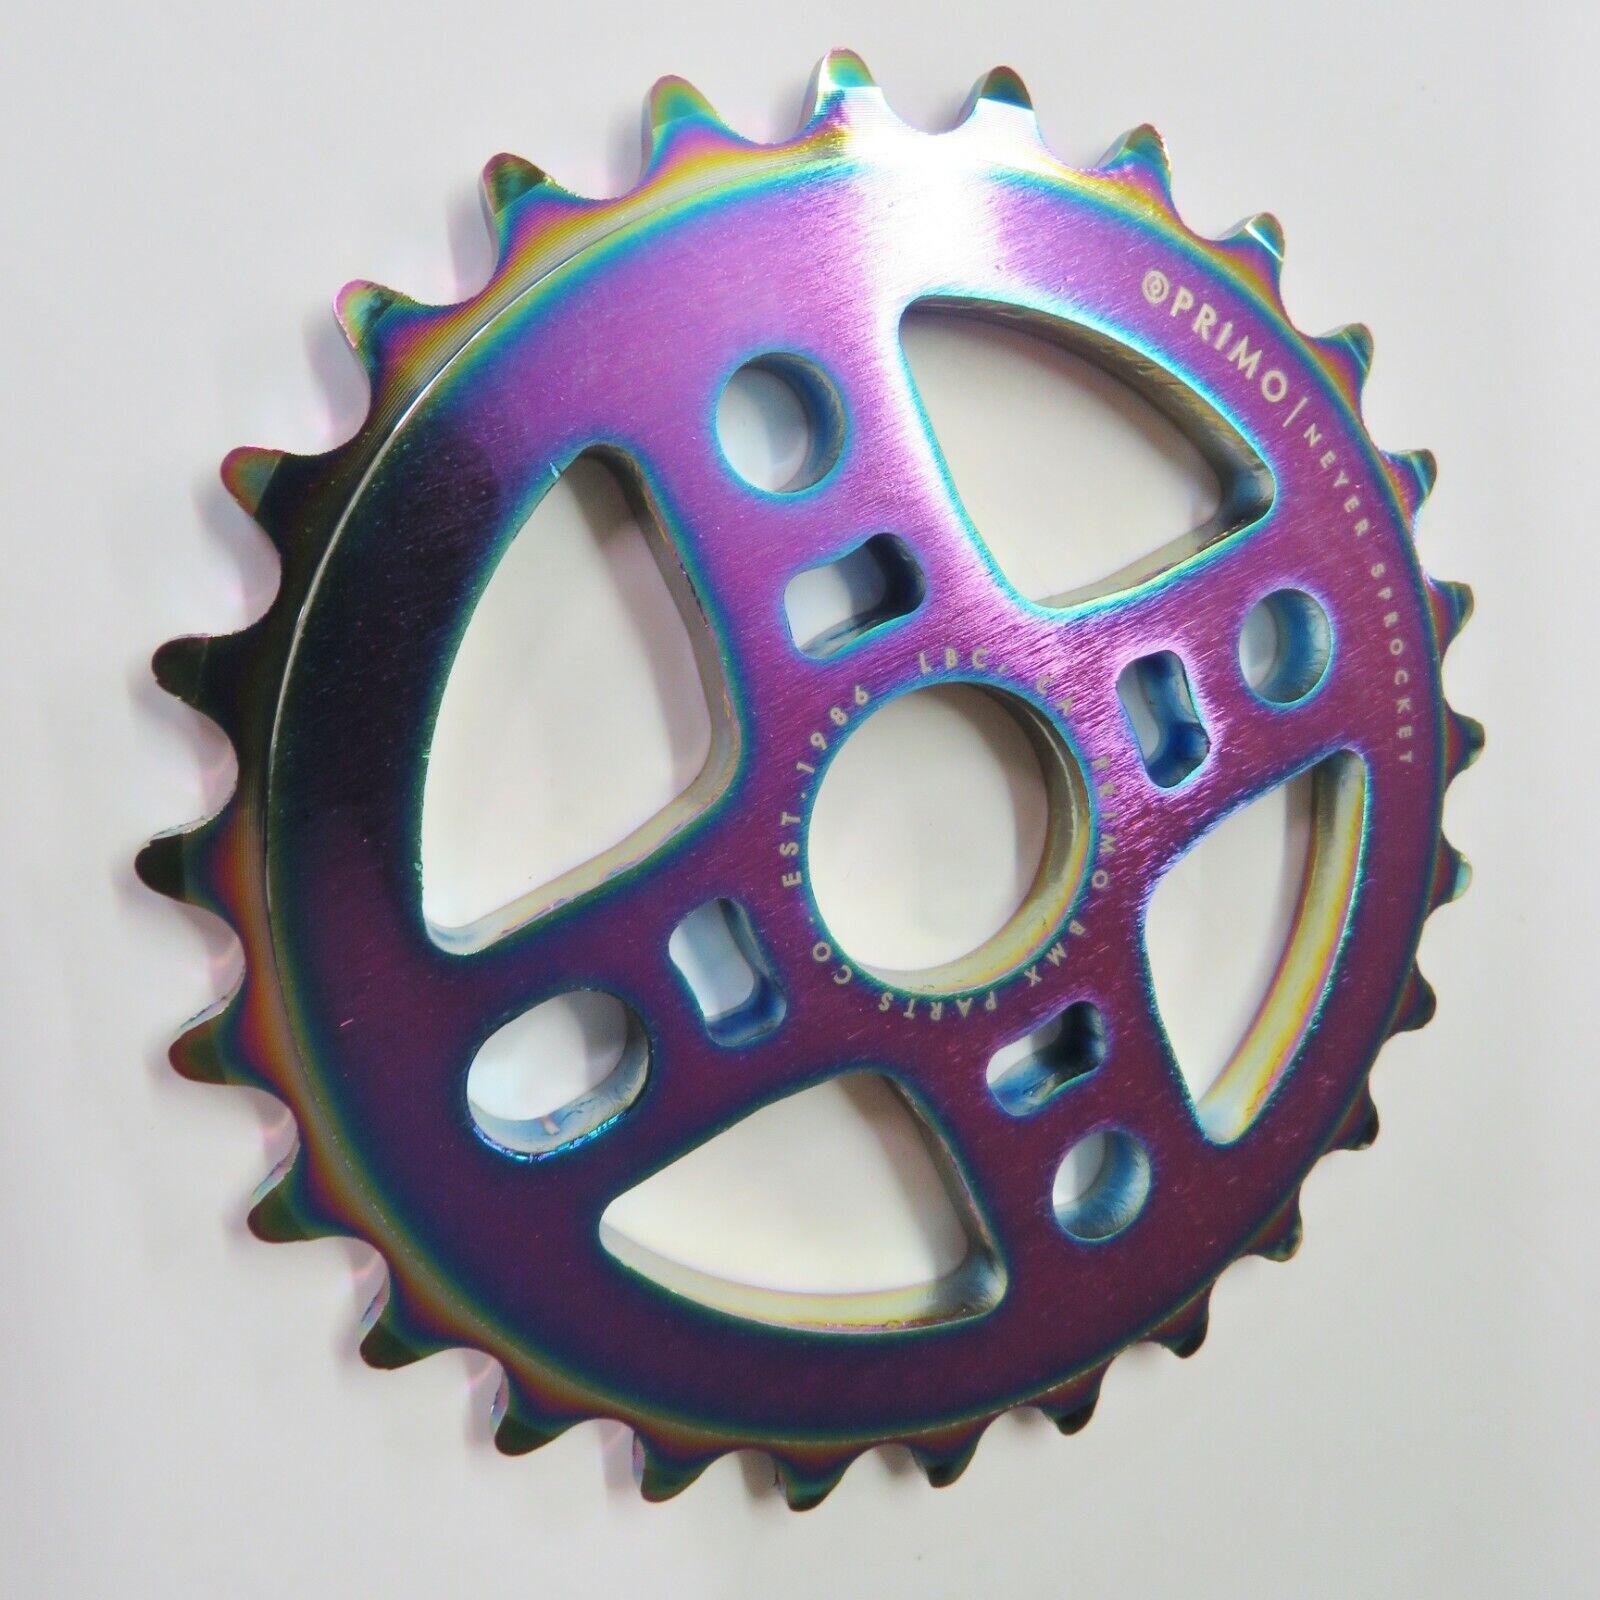 NEW 28t teeth sprocket for Onesie Crank Bicycle//Silver 23mm Hexagonal